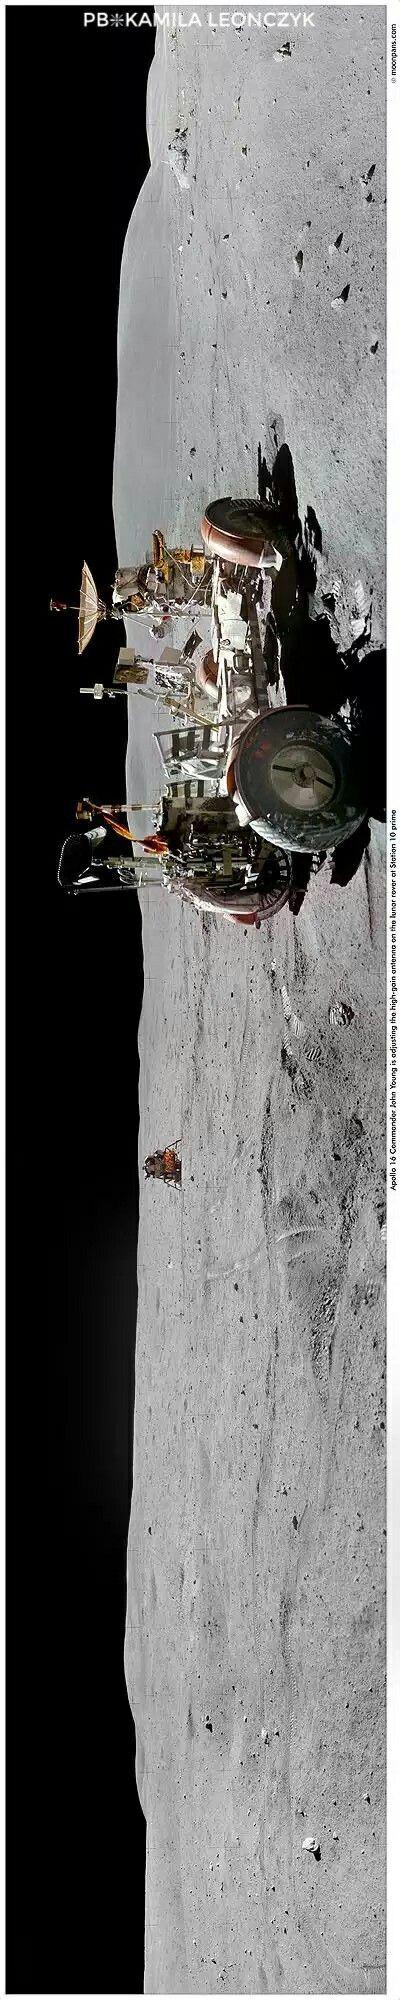 Panorama Apollo 16 Station 10 Prime - John Young at the Lunar Rover